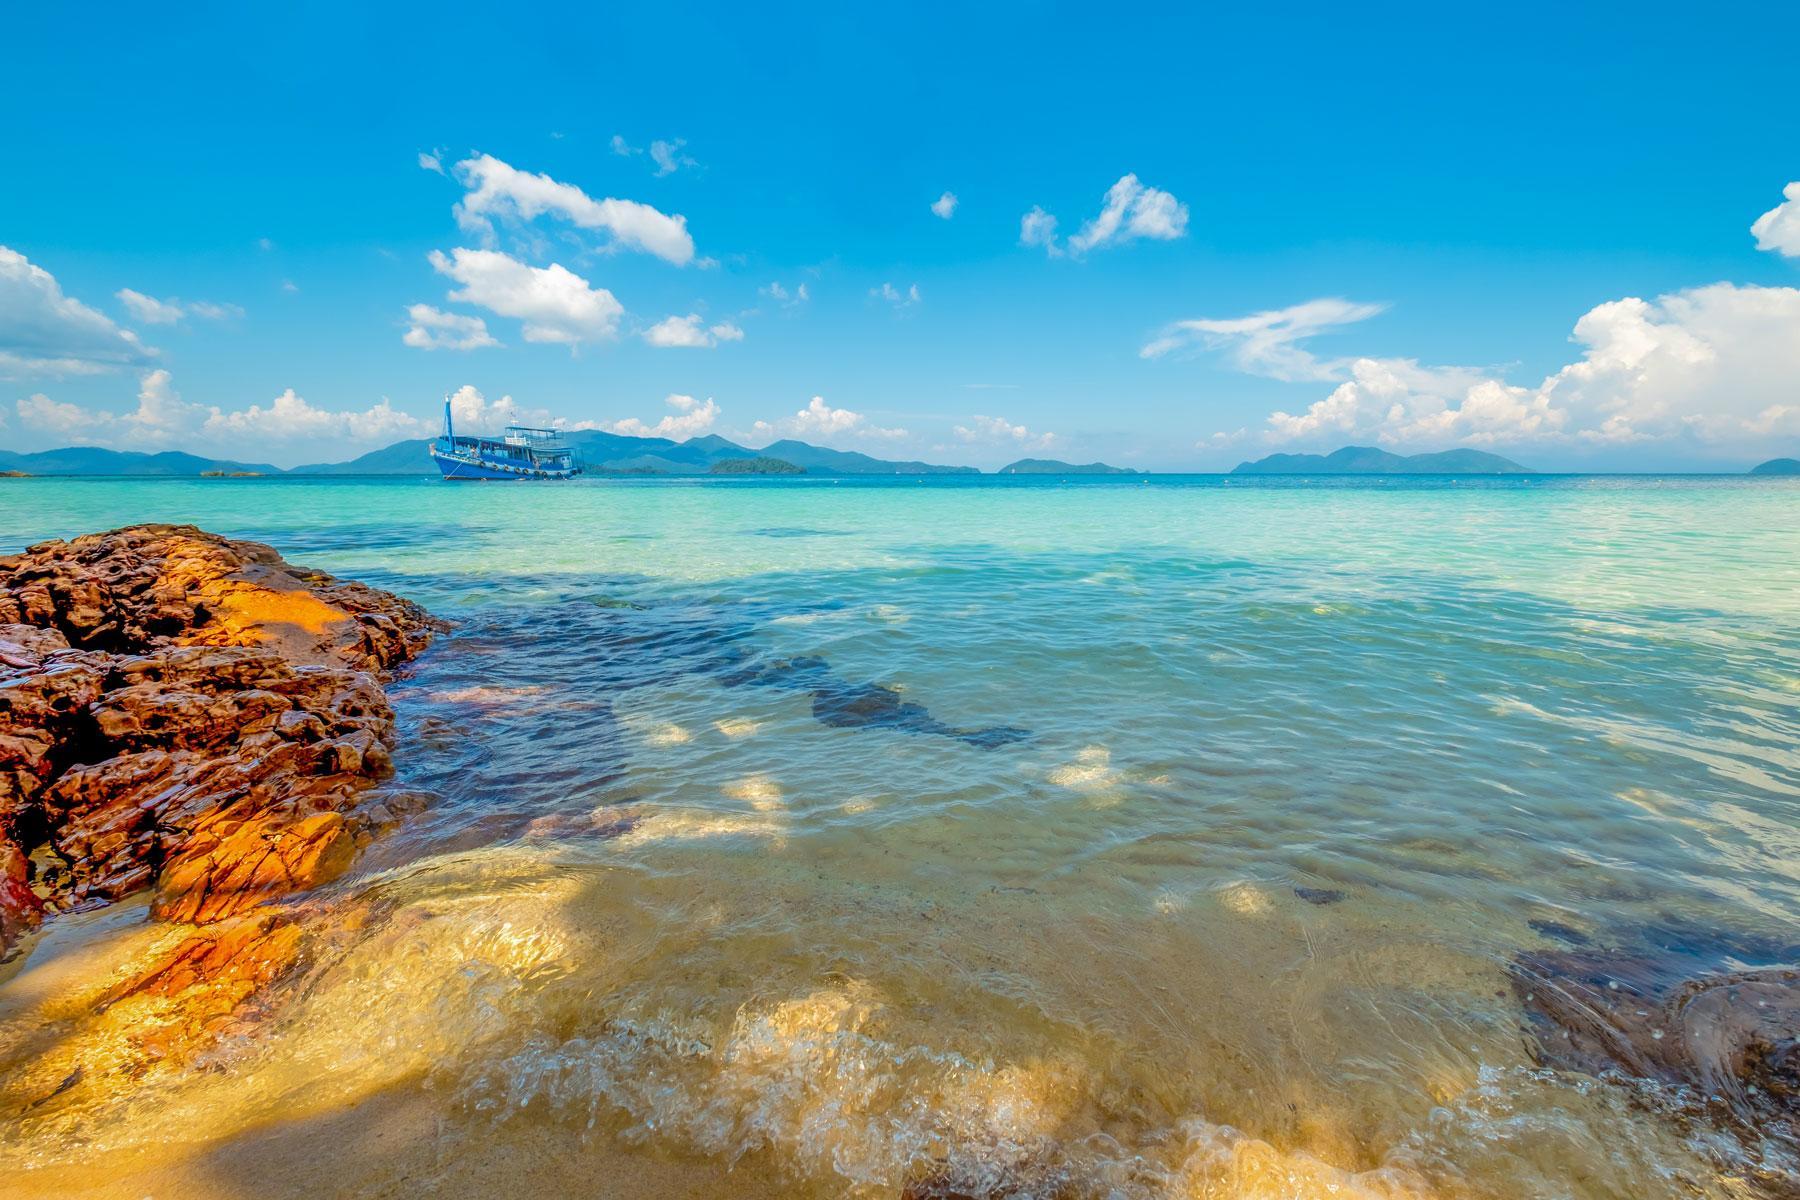 07_Thailand_Snorkeling_Diving_Koh_Wai_Shutterstock_753283759